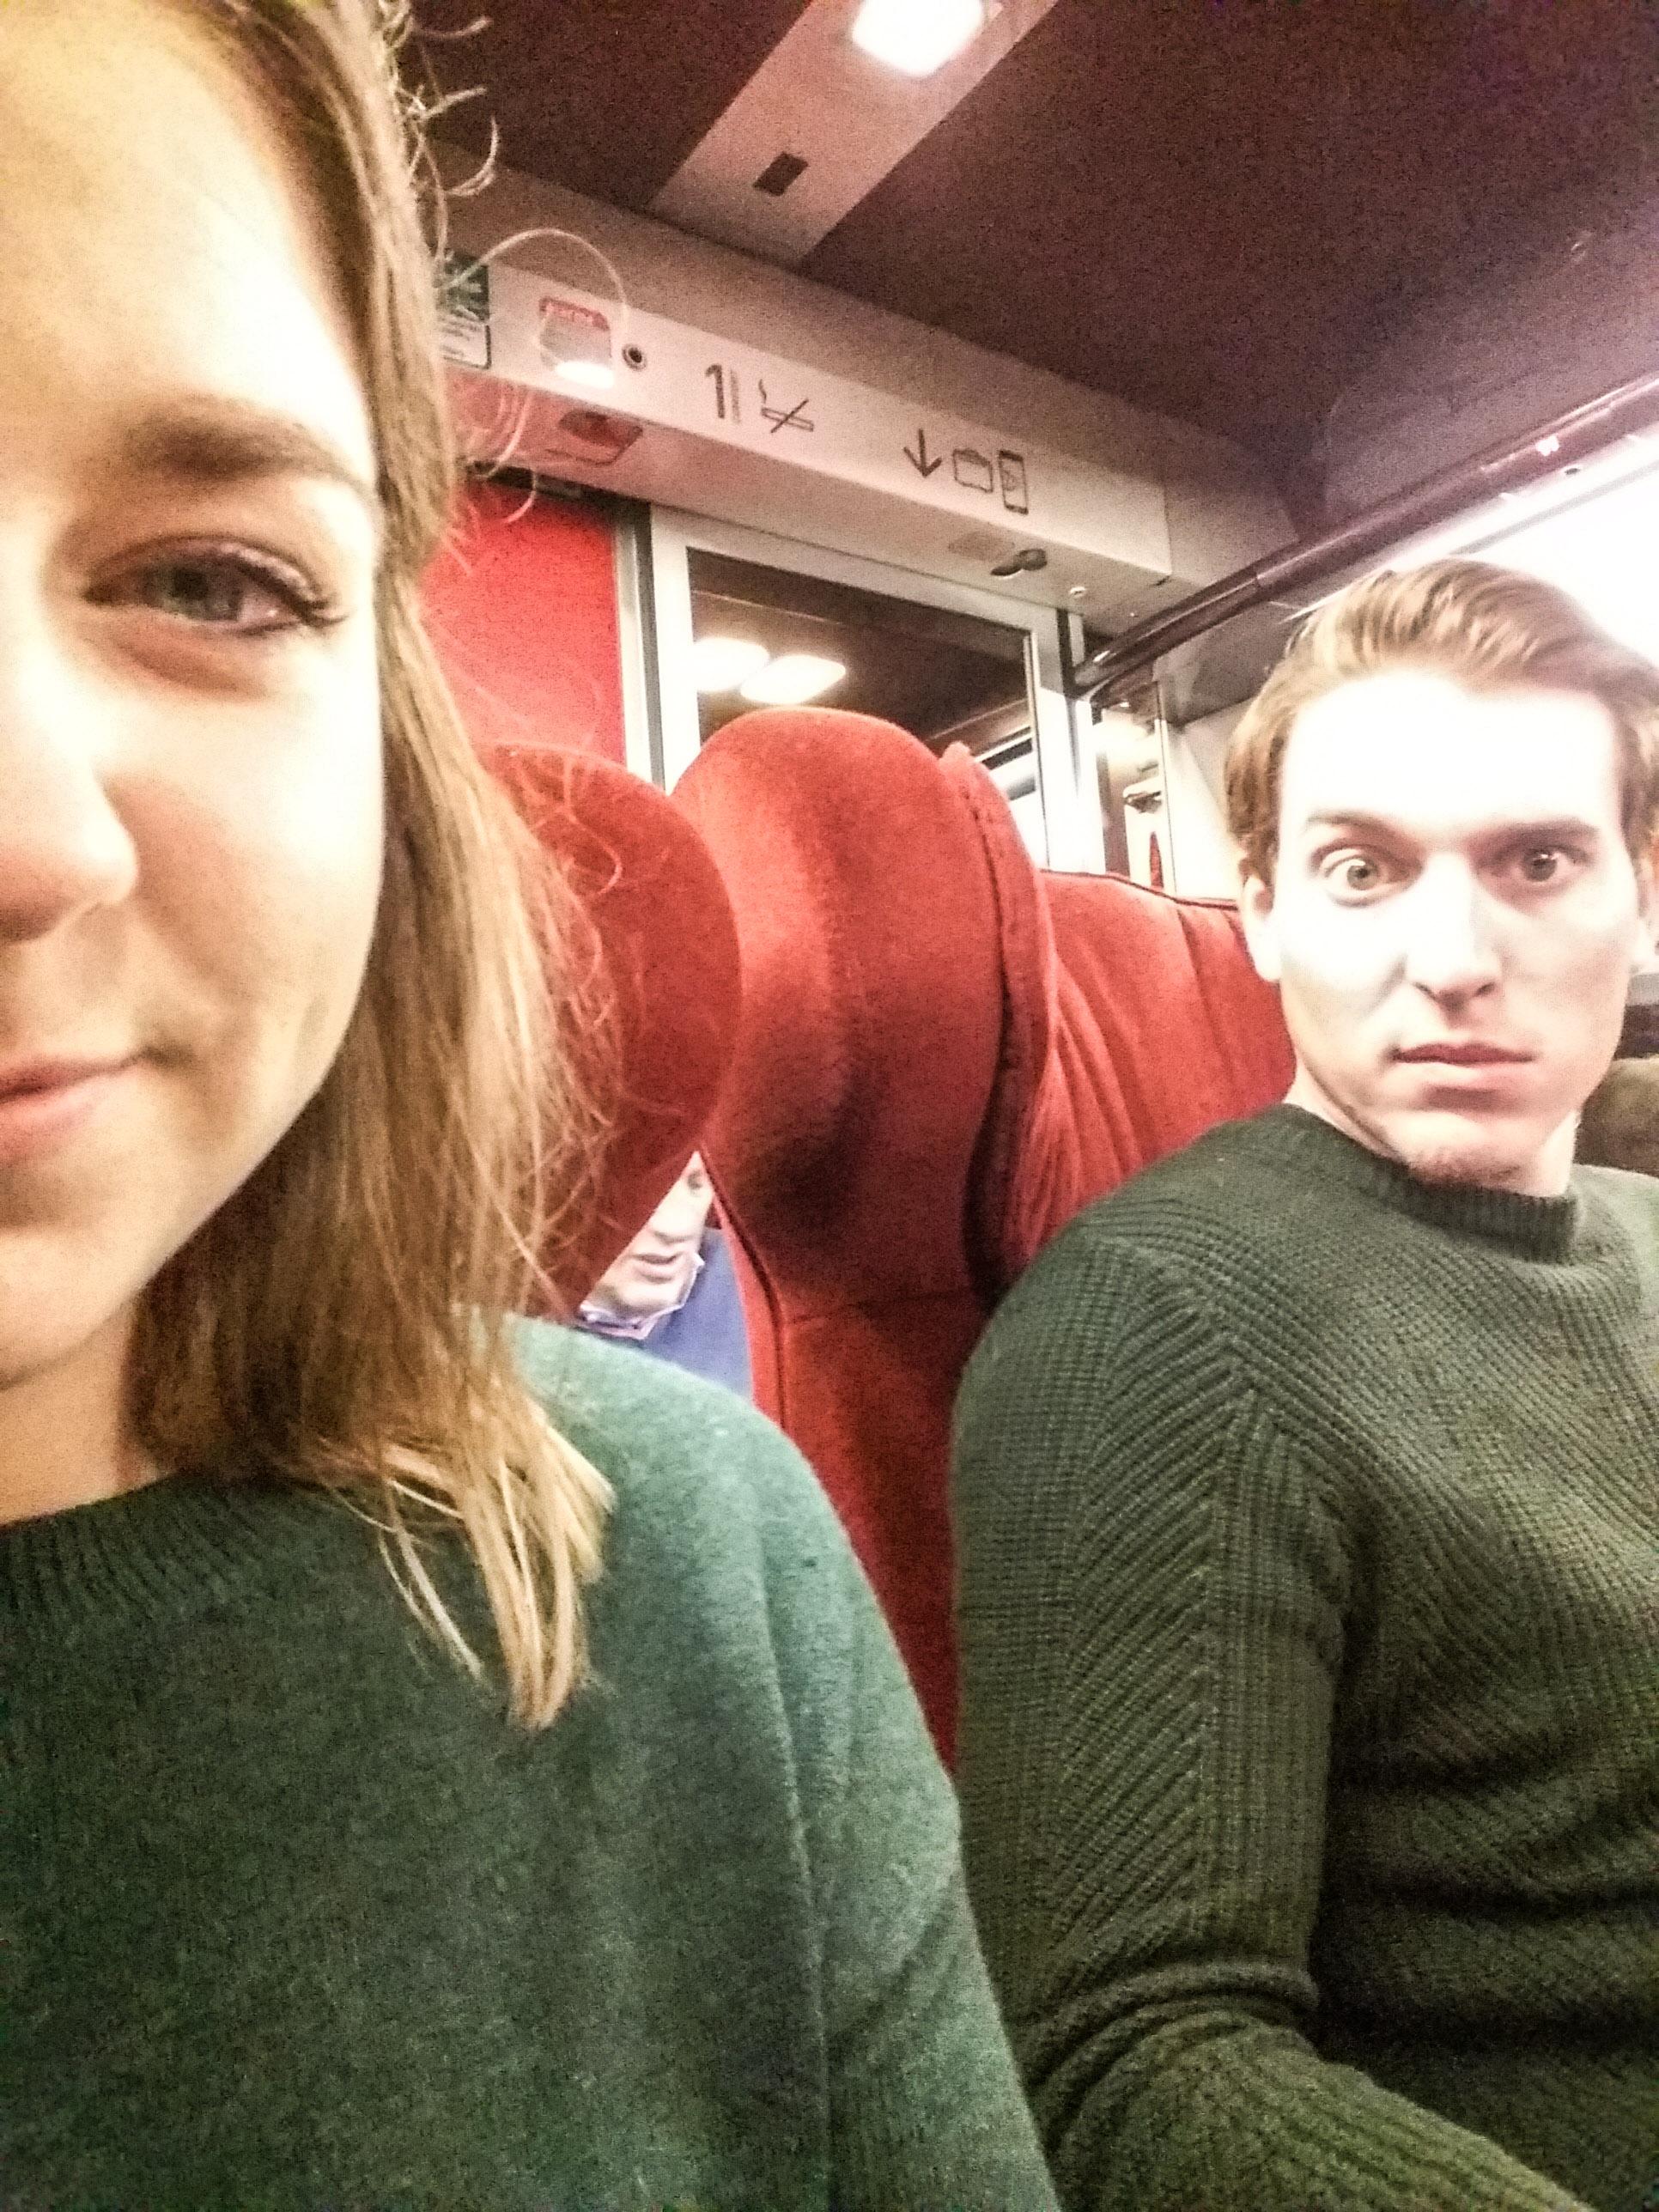 First class train ride - screaming children.